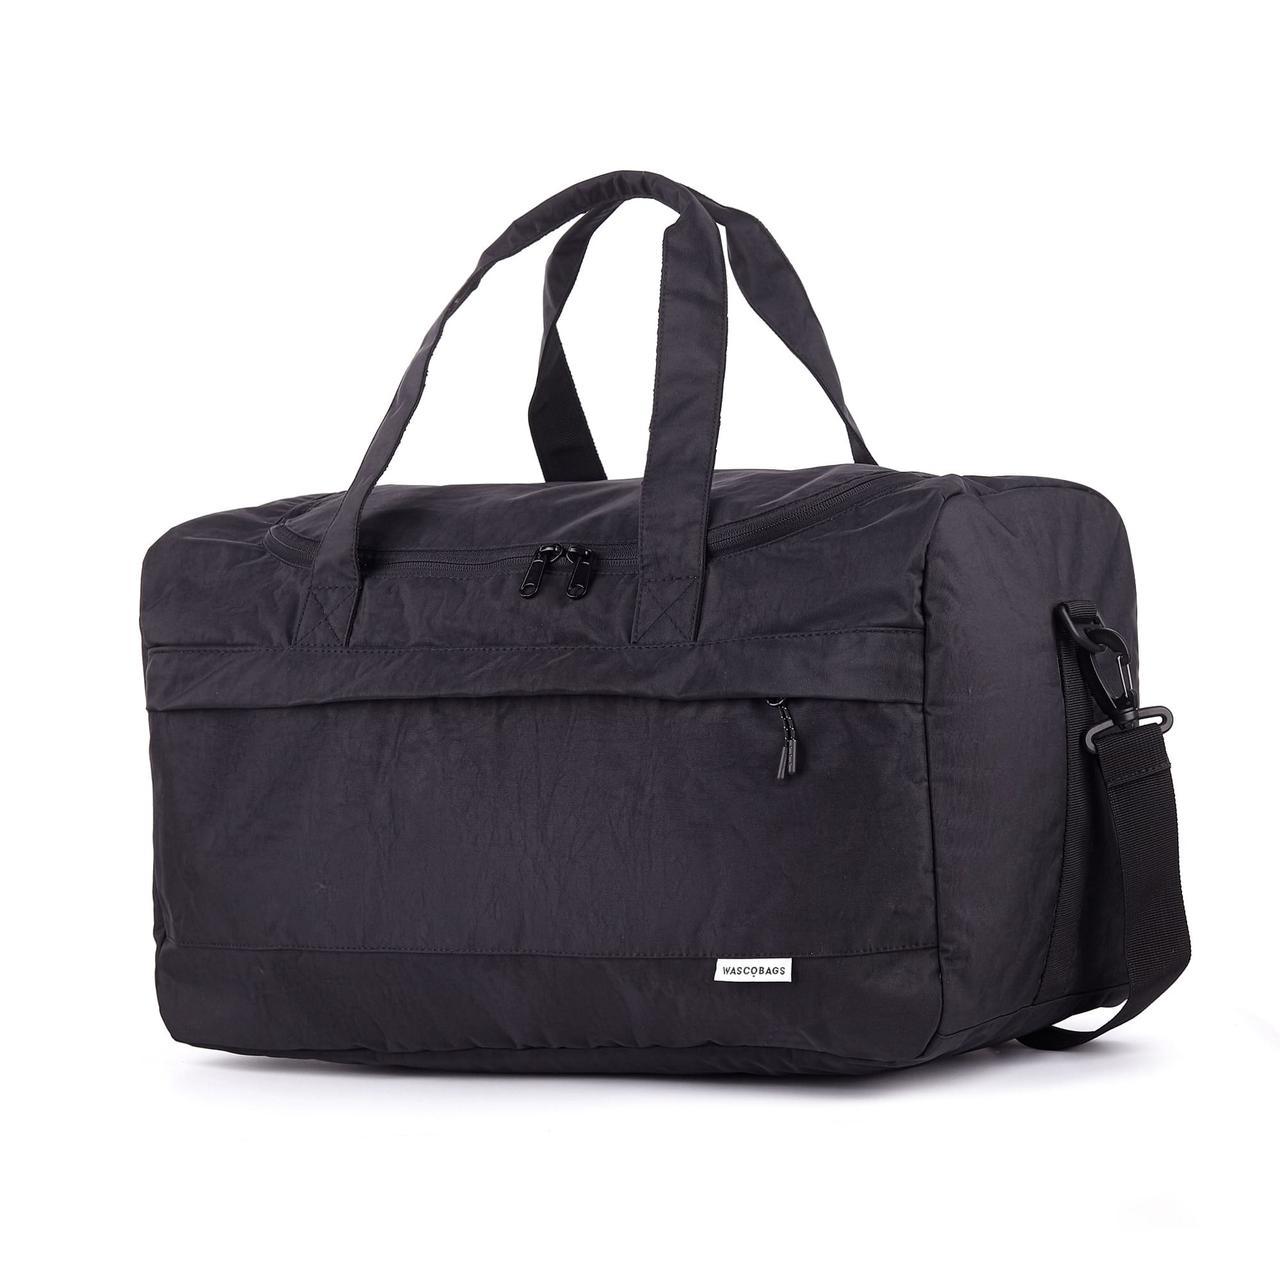 Дорожная сумка Wascobags Warsaw Черная (34 L)